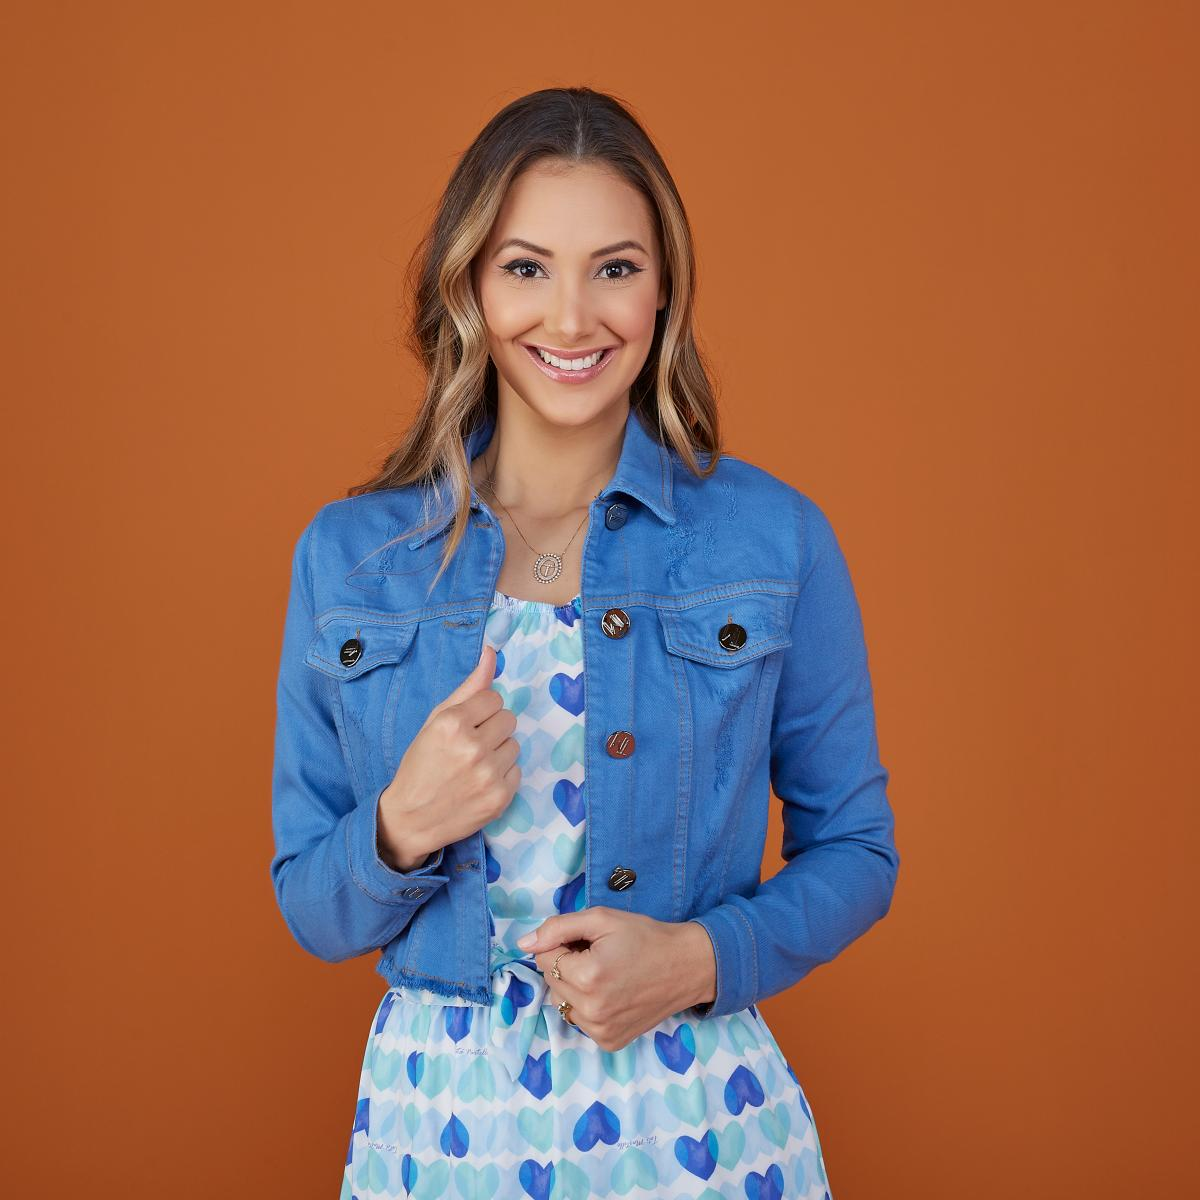 Jaqueta Jeans Colors, Moda Evangélica - Tatá Martello